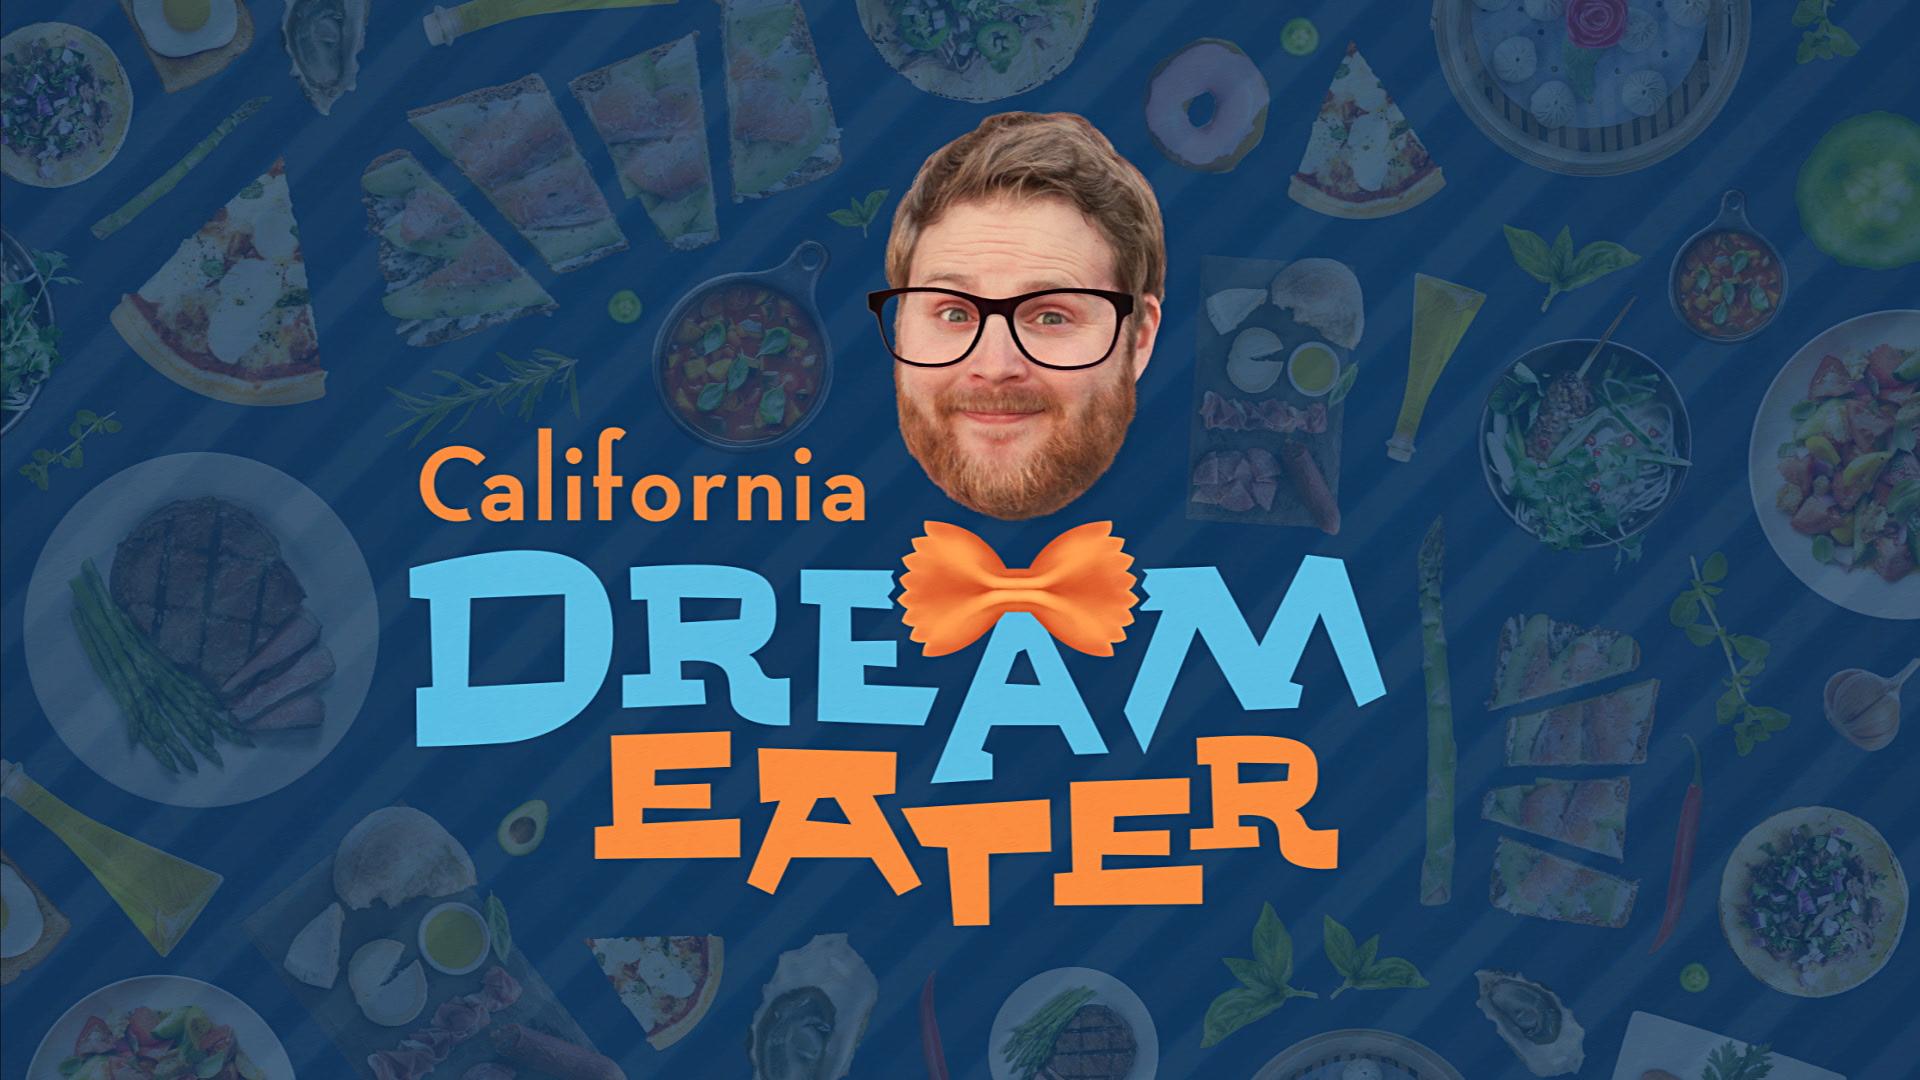 CALIFORNIA DREAM EATER TITLE